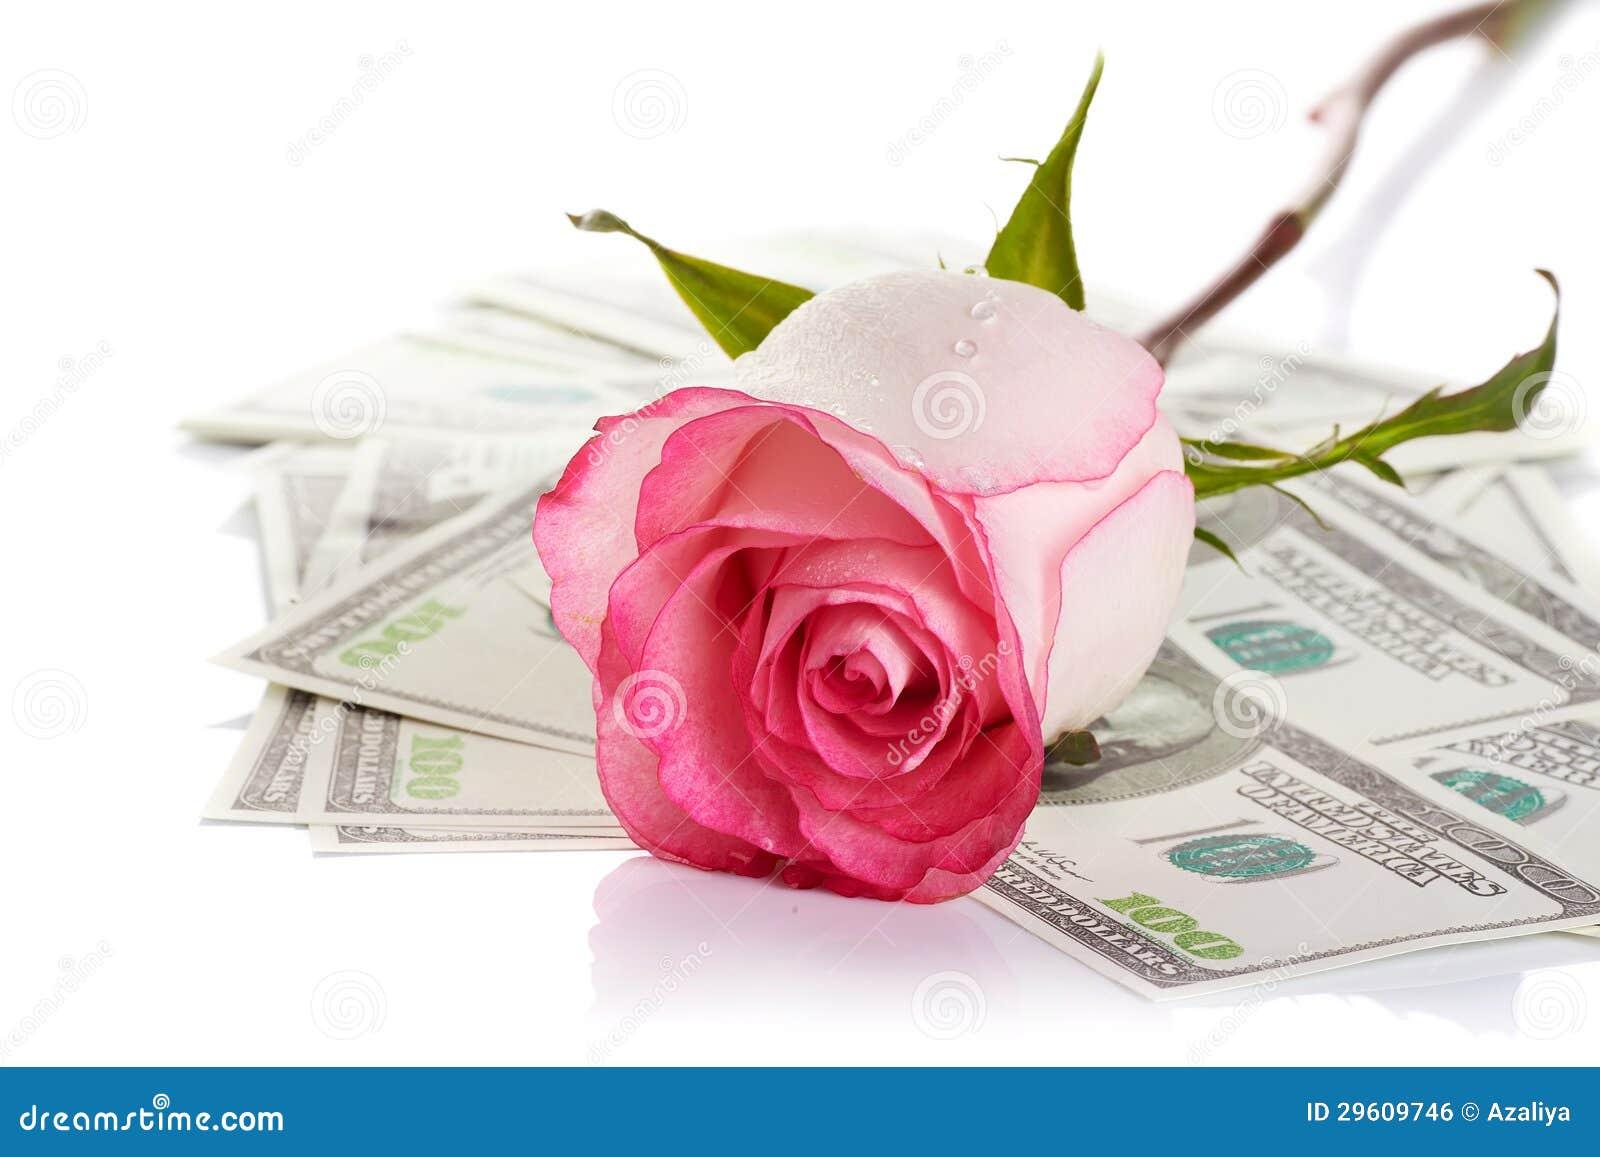 Free download money pink floyd mp3